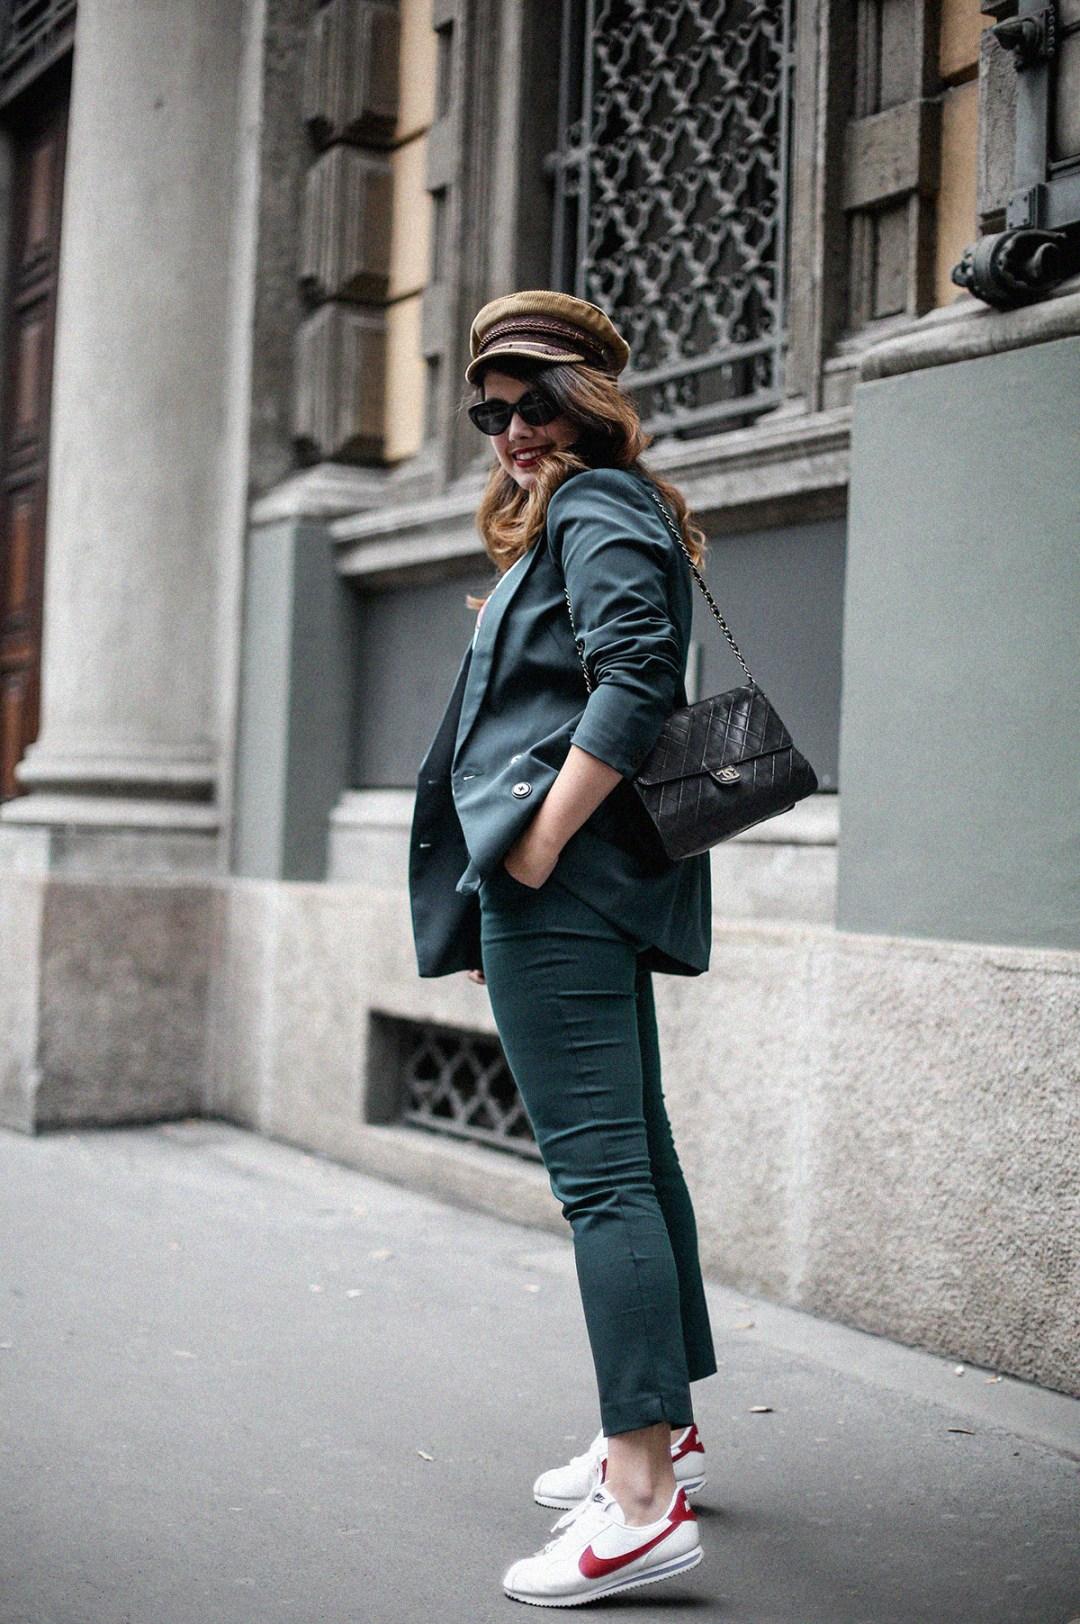 traje-verde-trench-look-entretiempo-myblueberrynightsblog9